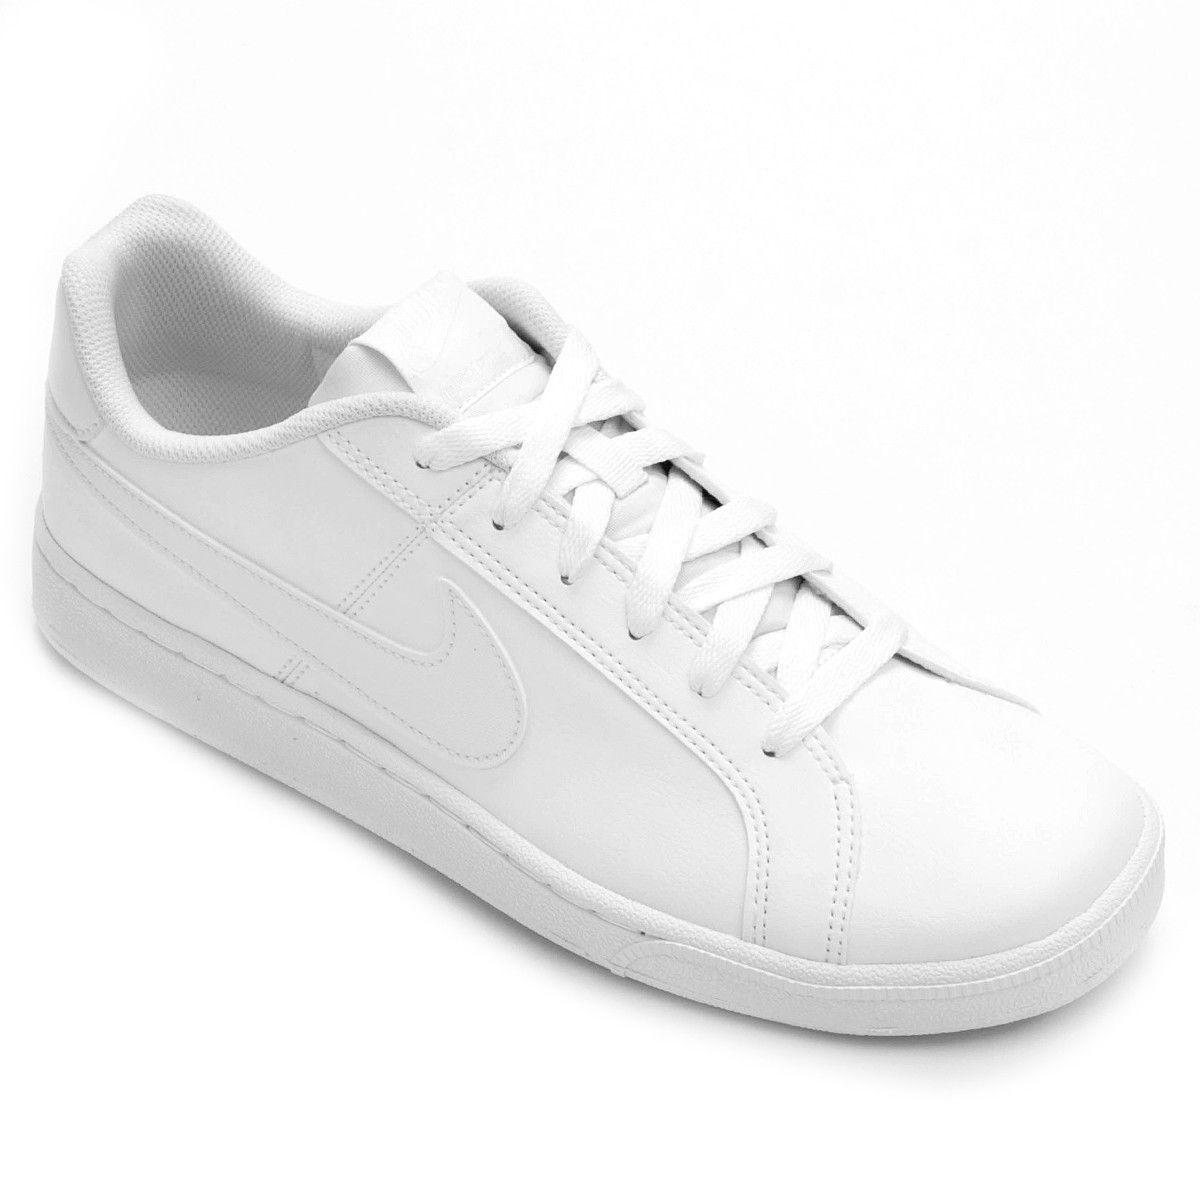 garantía limitada baratas para la venta gran descuento venta Tênis Couro Nike Court Royale Masculino - Branco | Tênis nike ...